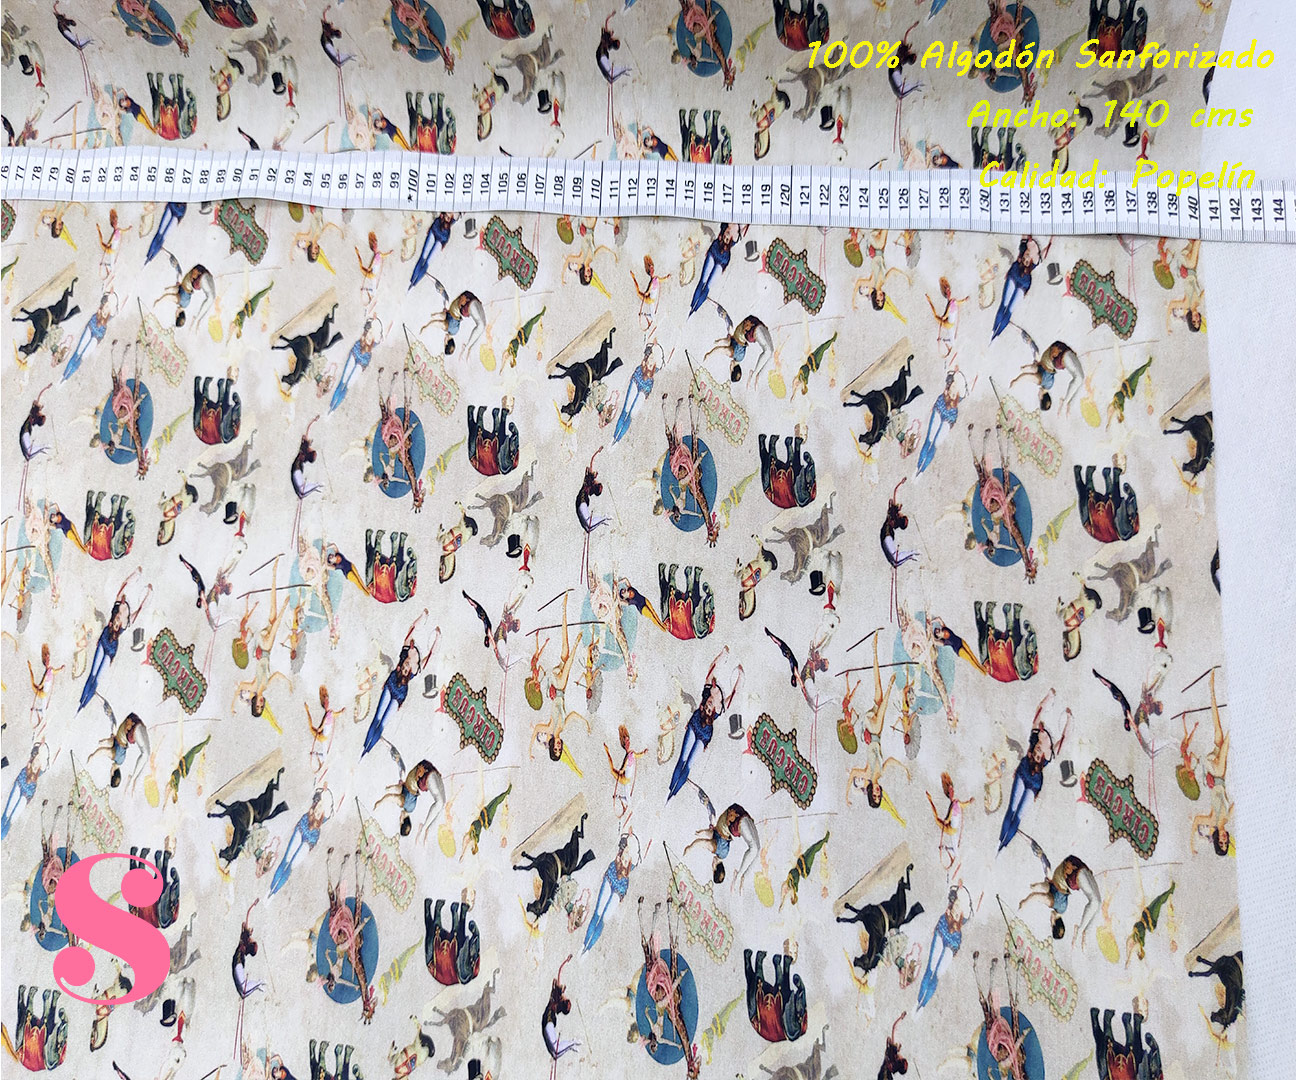 437-figuras-tejidos-estampado-popelin-sanforizado,Tejido Algodón Estampado Circus